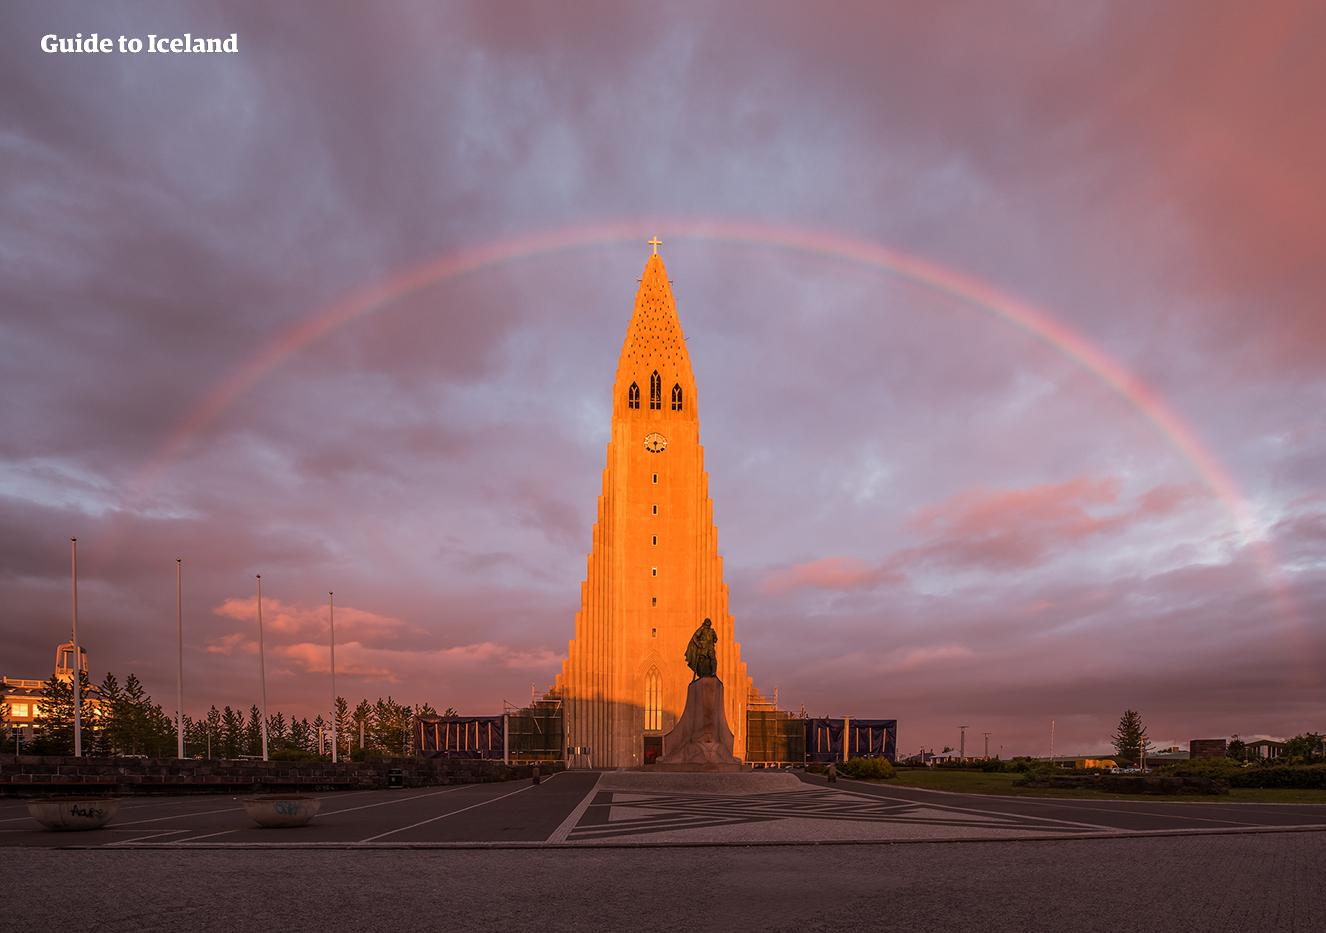 A rainbow over Hallgrímskirkja church in Reykjavik.